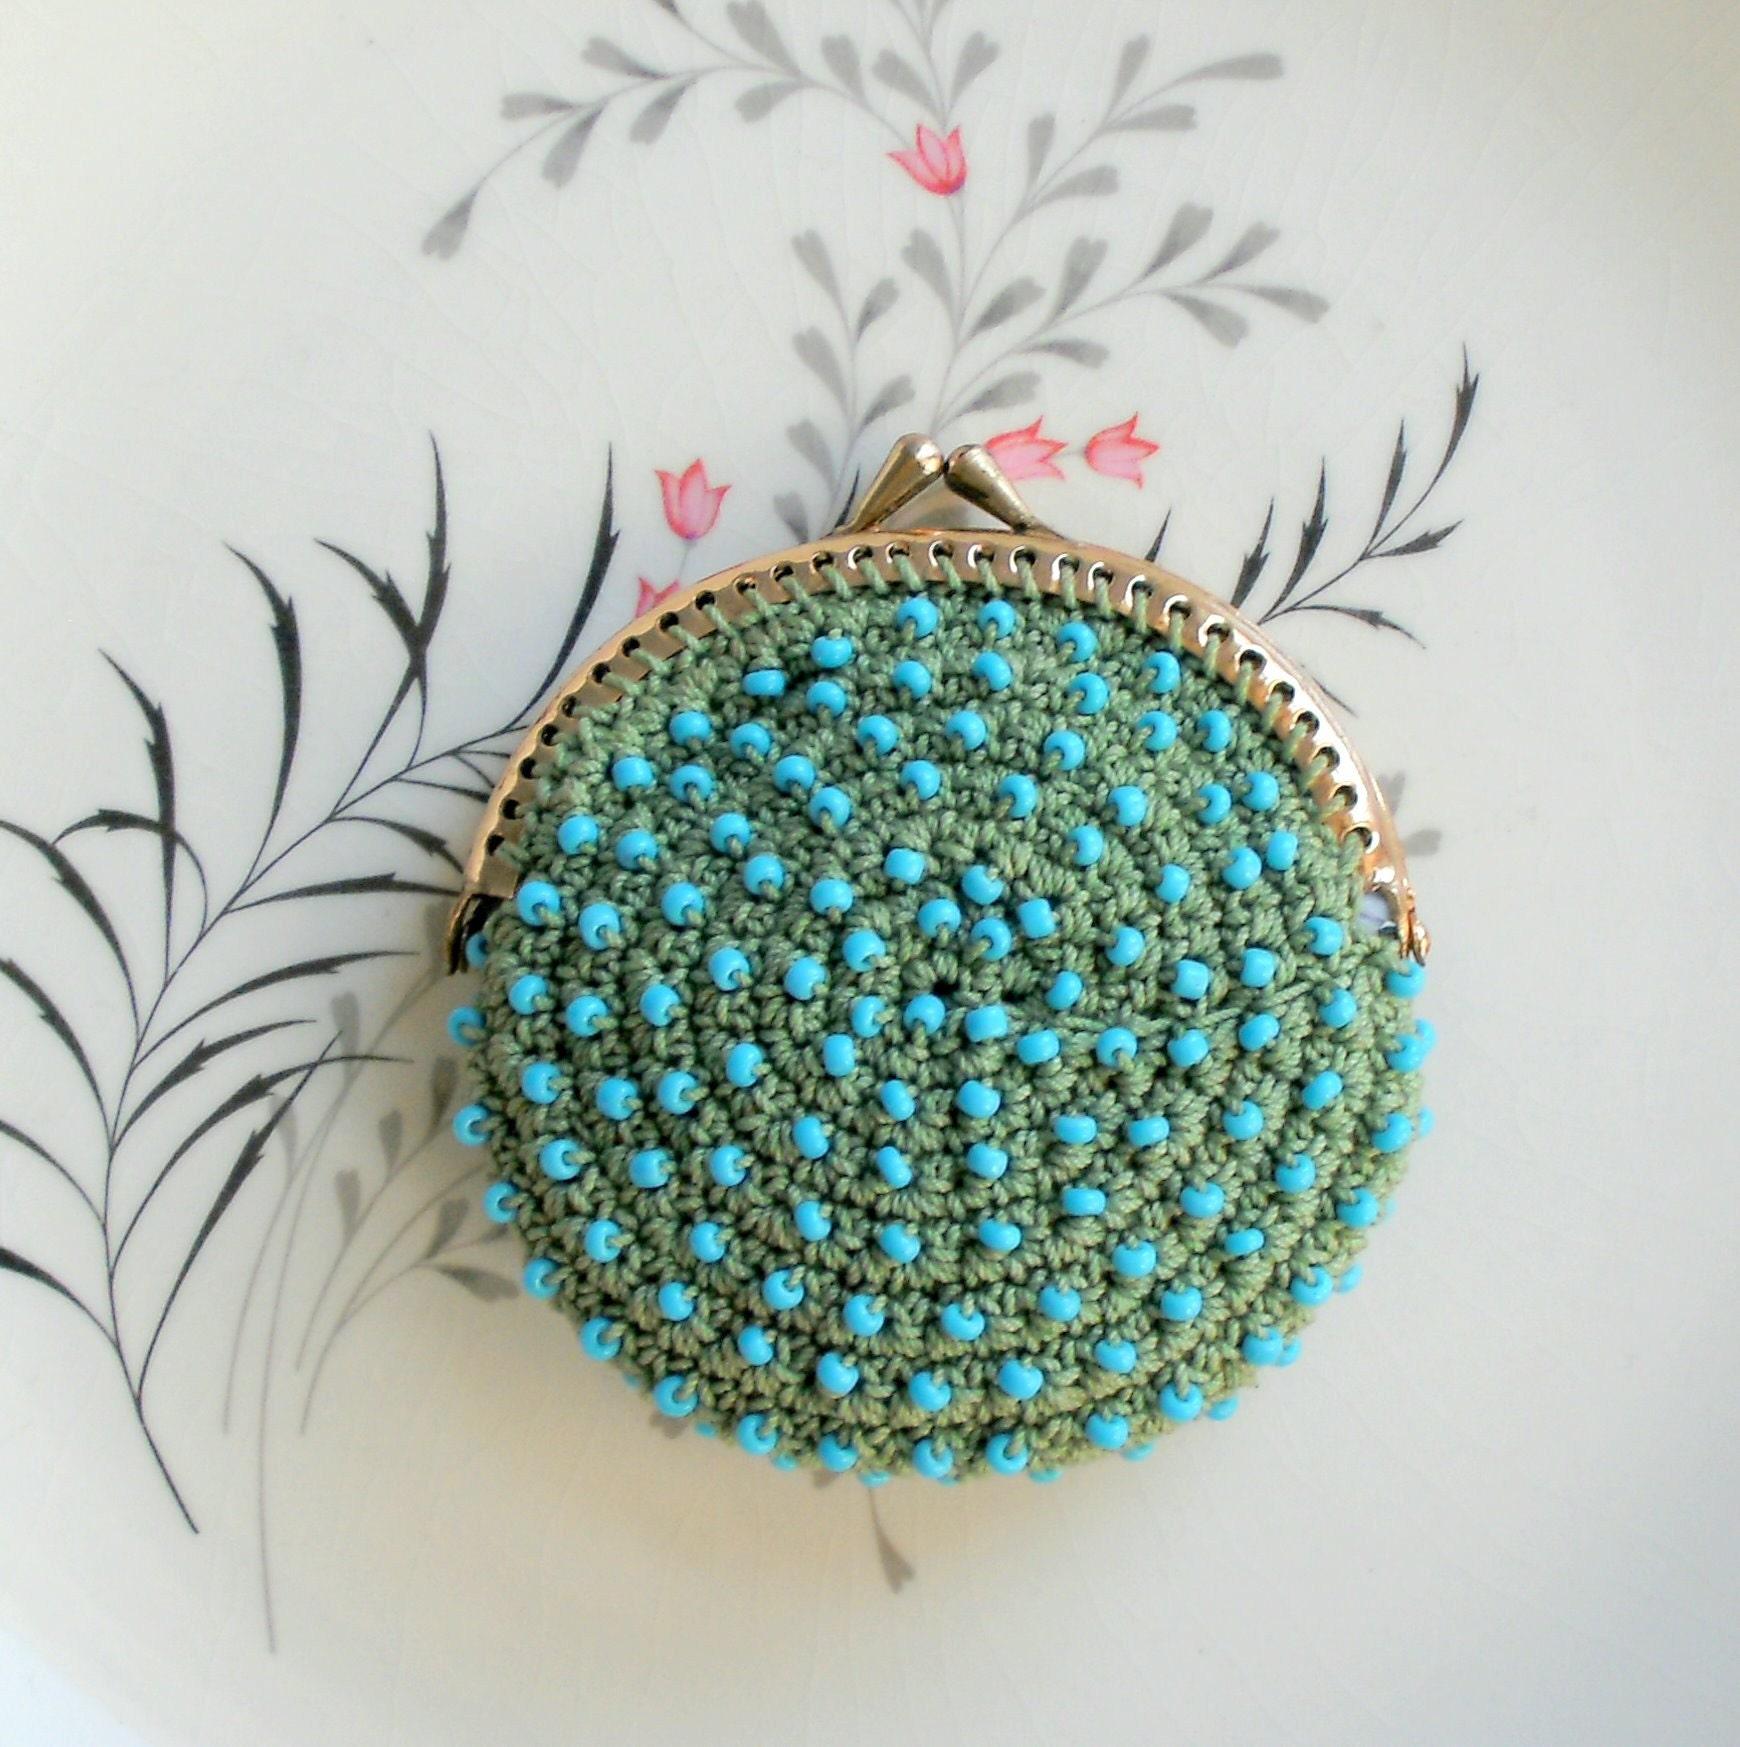 Crochet Little Purse : Little Sage Green Crochet Coin Purse with Pale Blue by pinguim